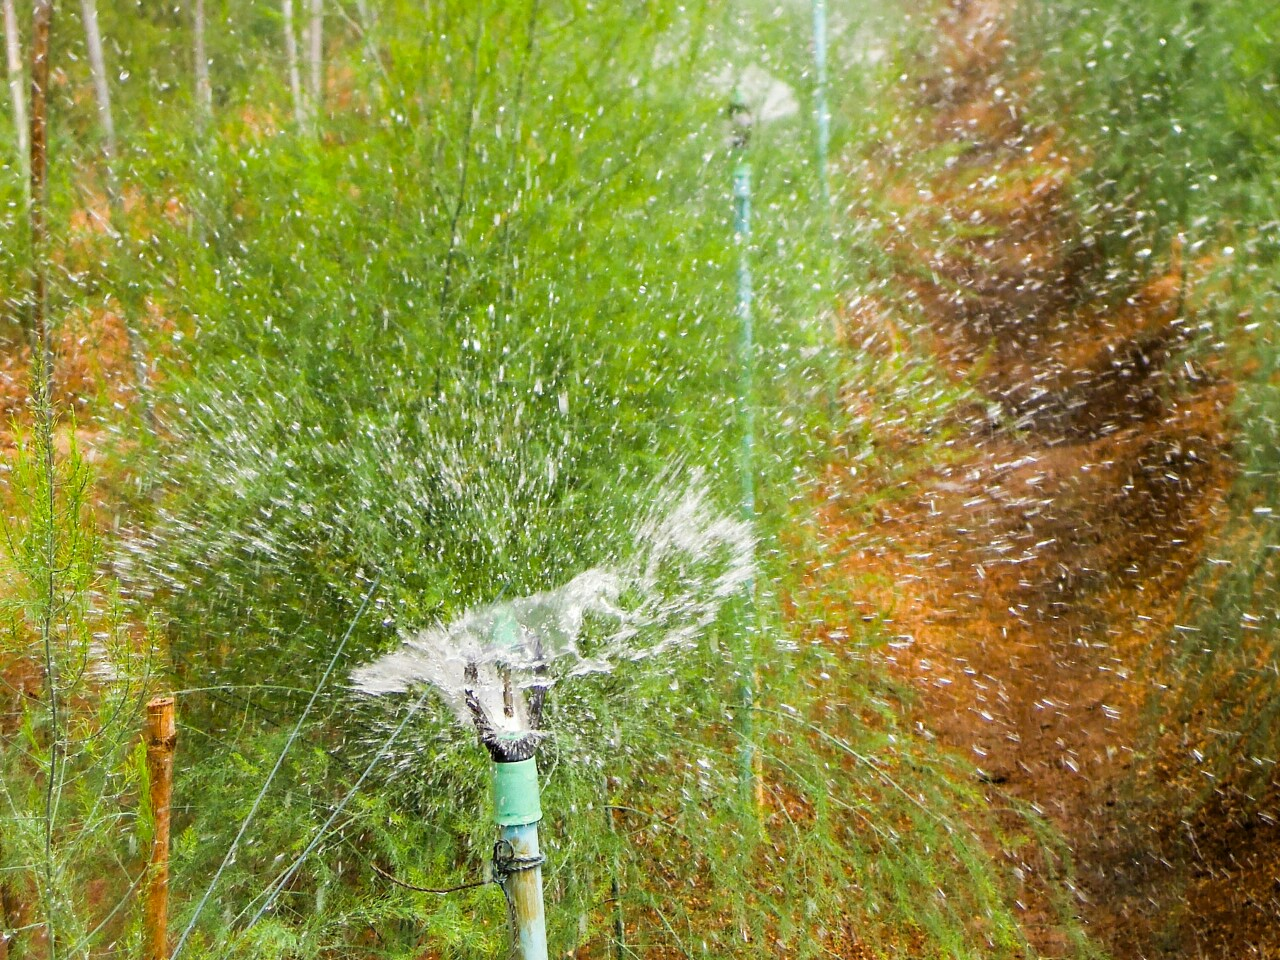 Spargel bewaesserung Sprinkler organic17